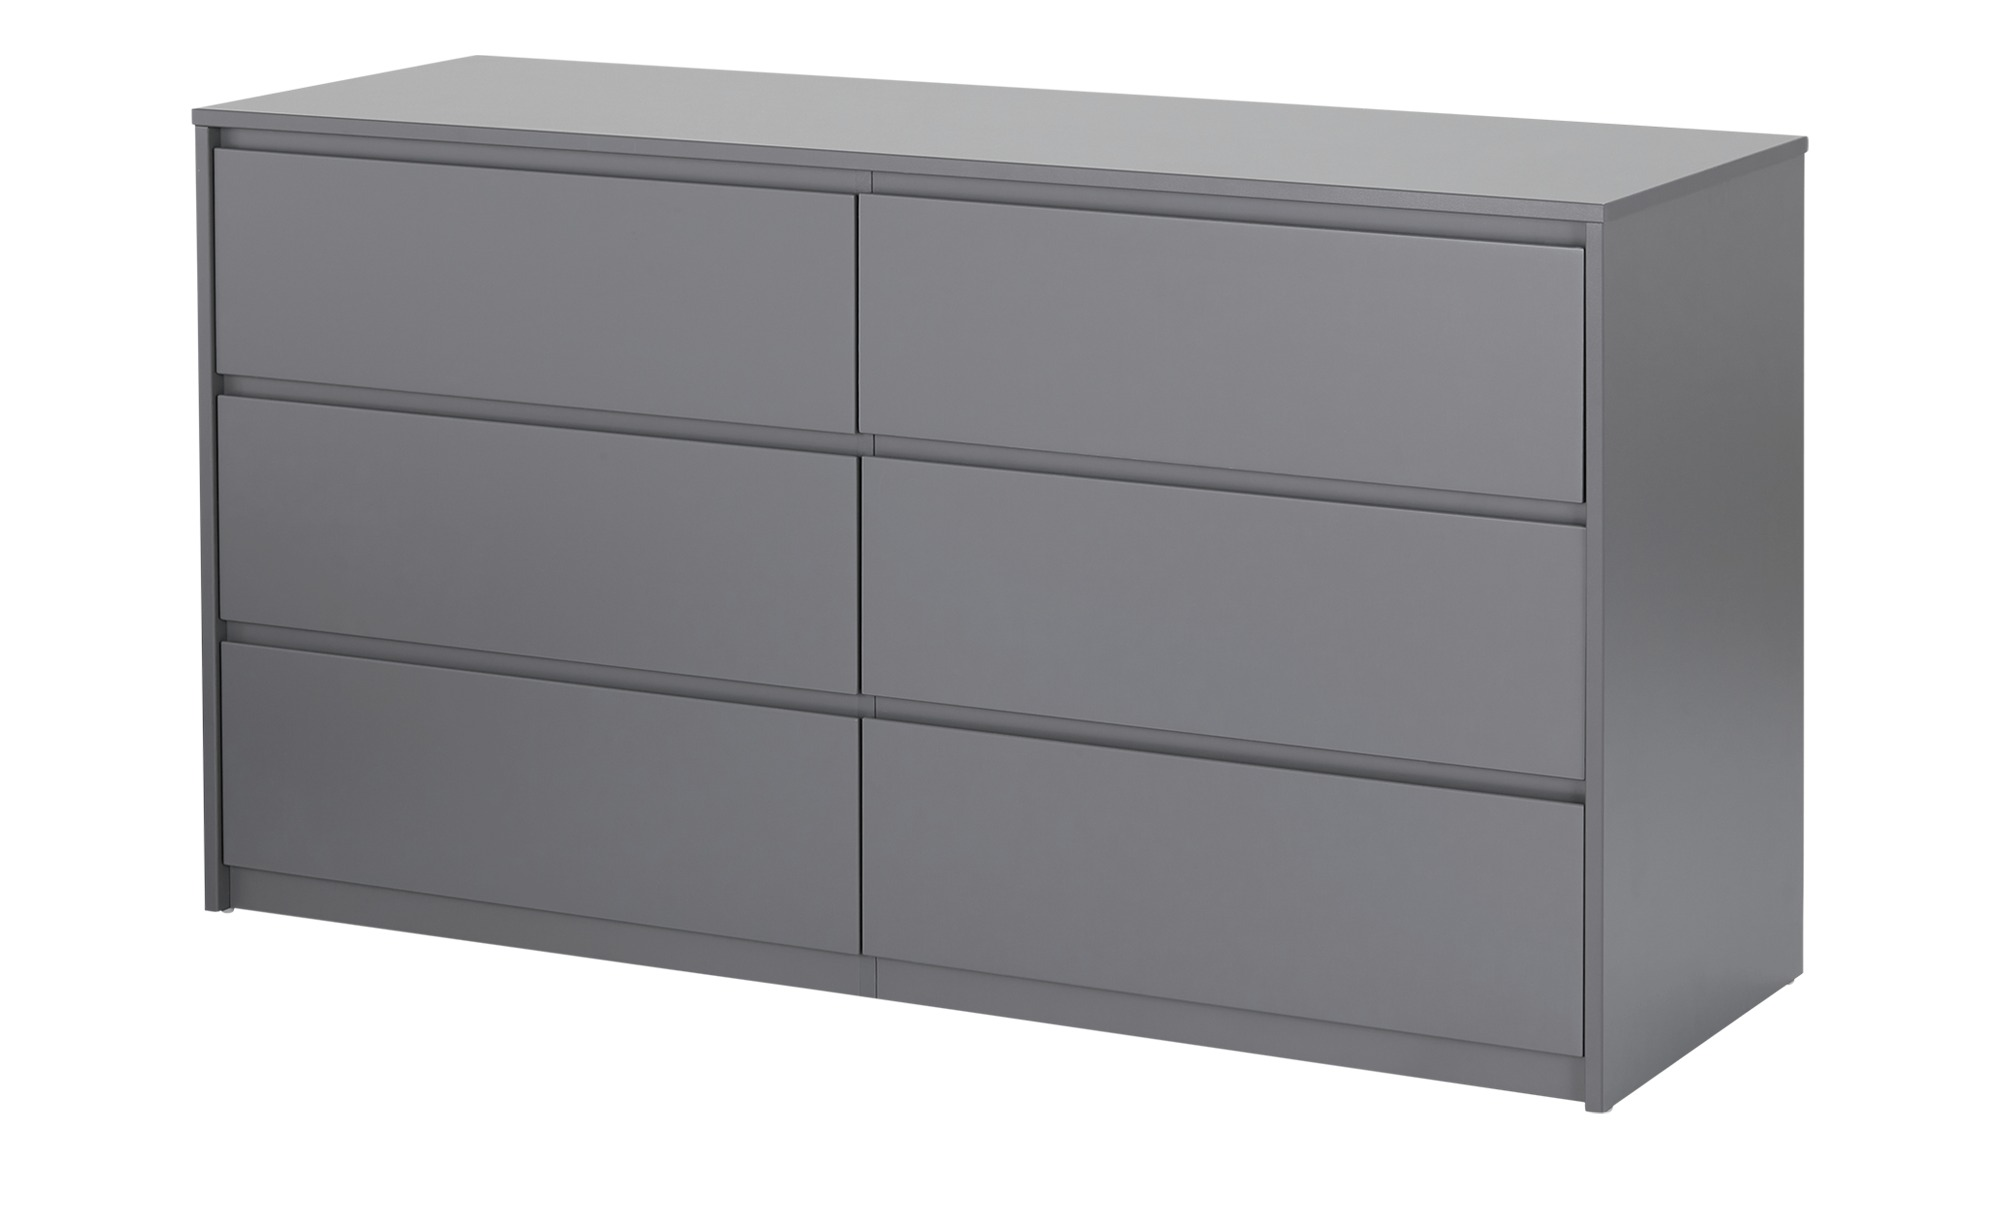 smart Kommode  Ben ¦ grau ¦ Maße (cm): B: 140 H: 75,5 T: 48 Kommoden & Sideboards > Sideboards - Höffner